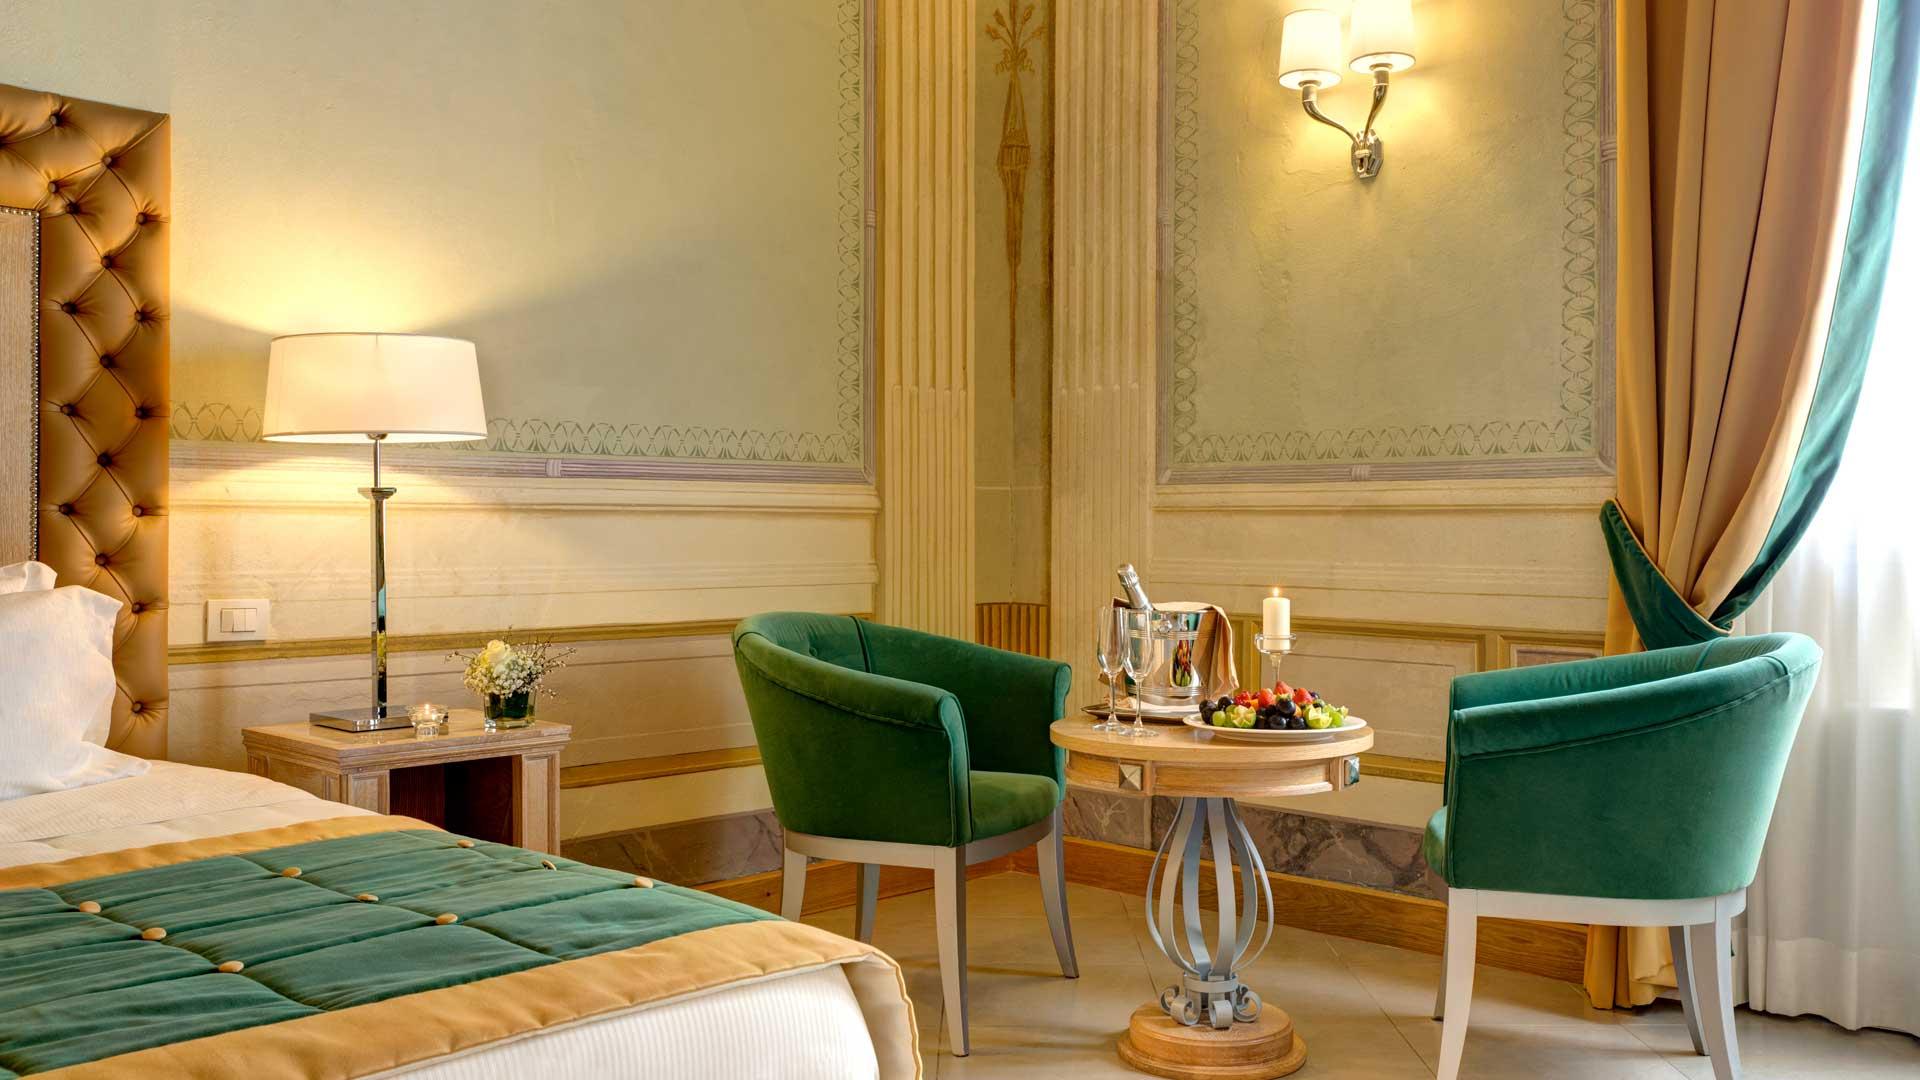 Camere & Suite - Villa Tolomei Hotel & Resort 5 stelle